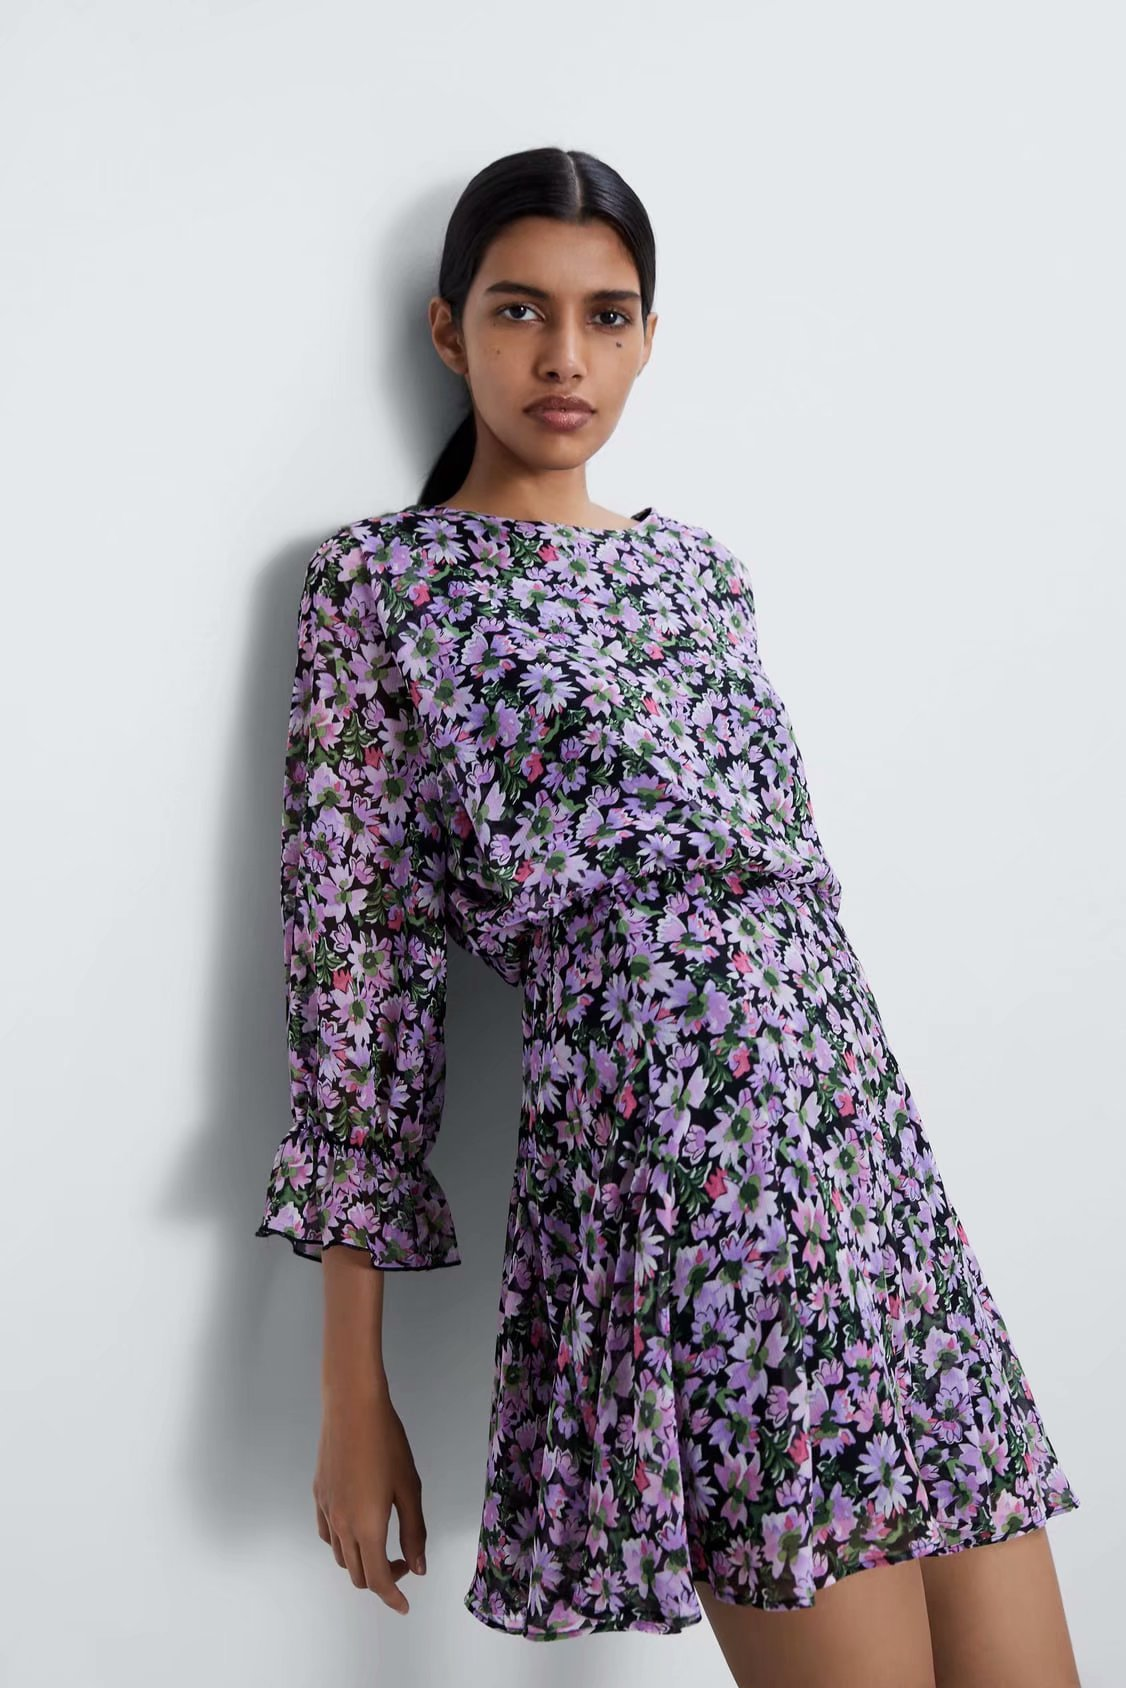 2020 New Spring Summer New Style European Printed Women female Dress zaraing vadiming sheining women dress